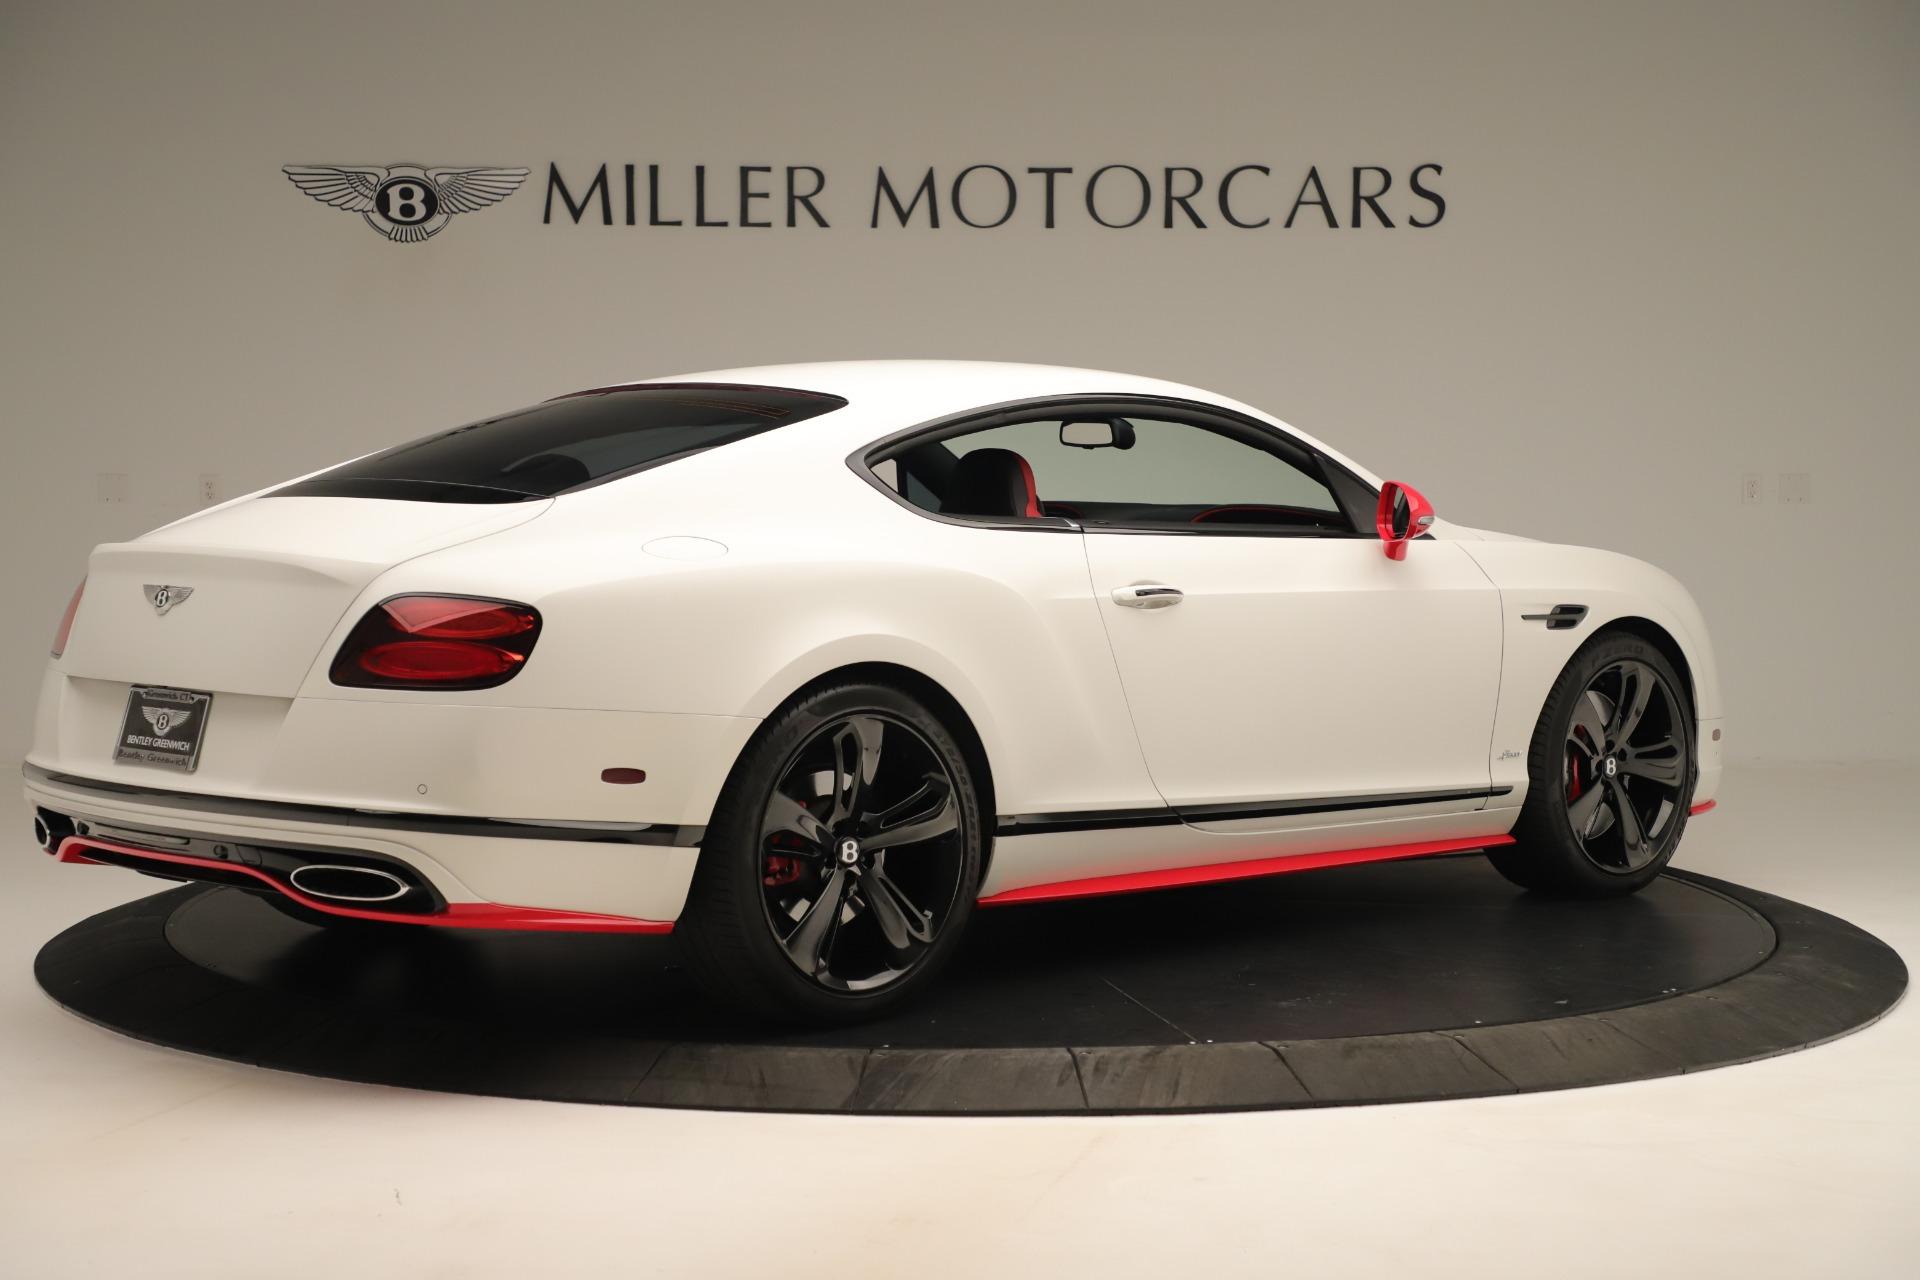 Used 2017 Bentley Continental GT Speed For Sale In Westport, CT 706_p8